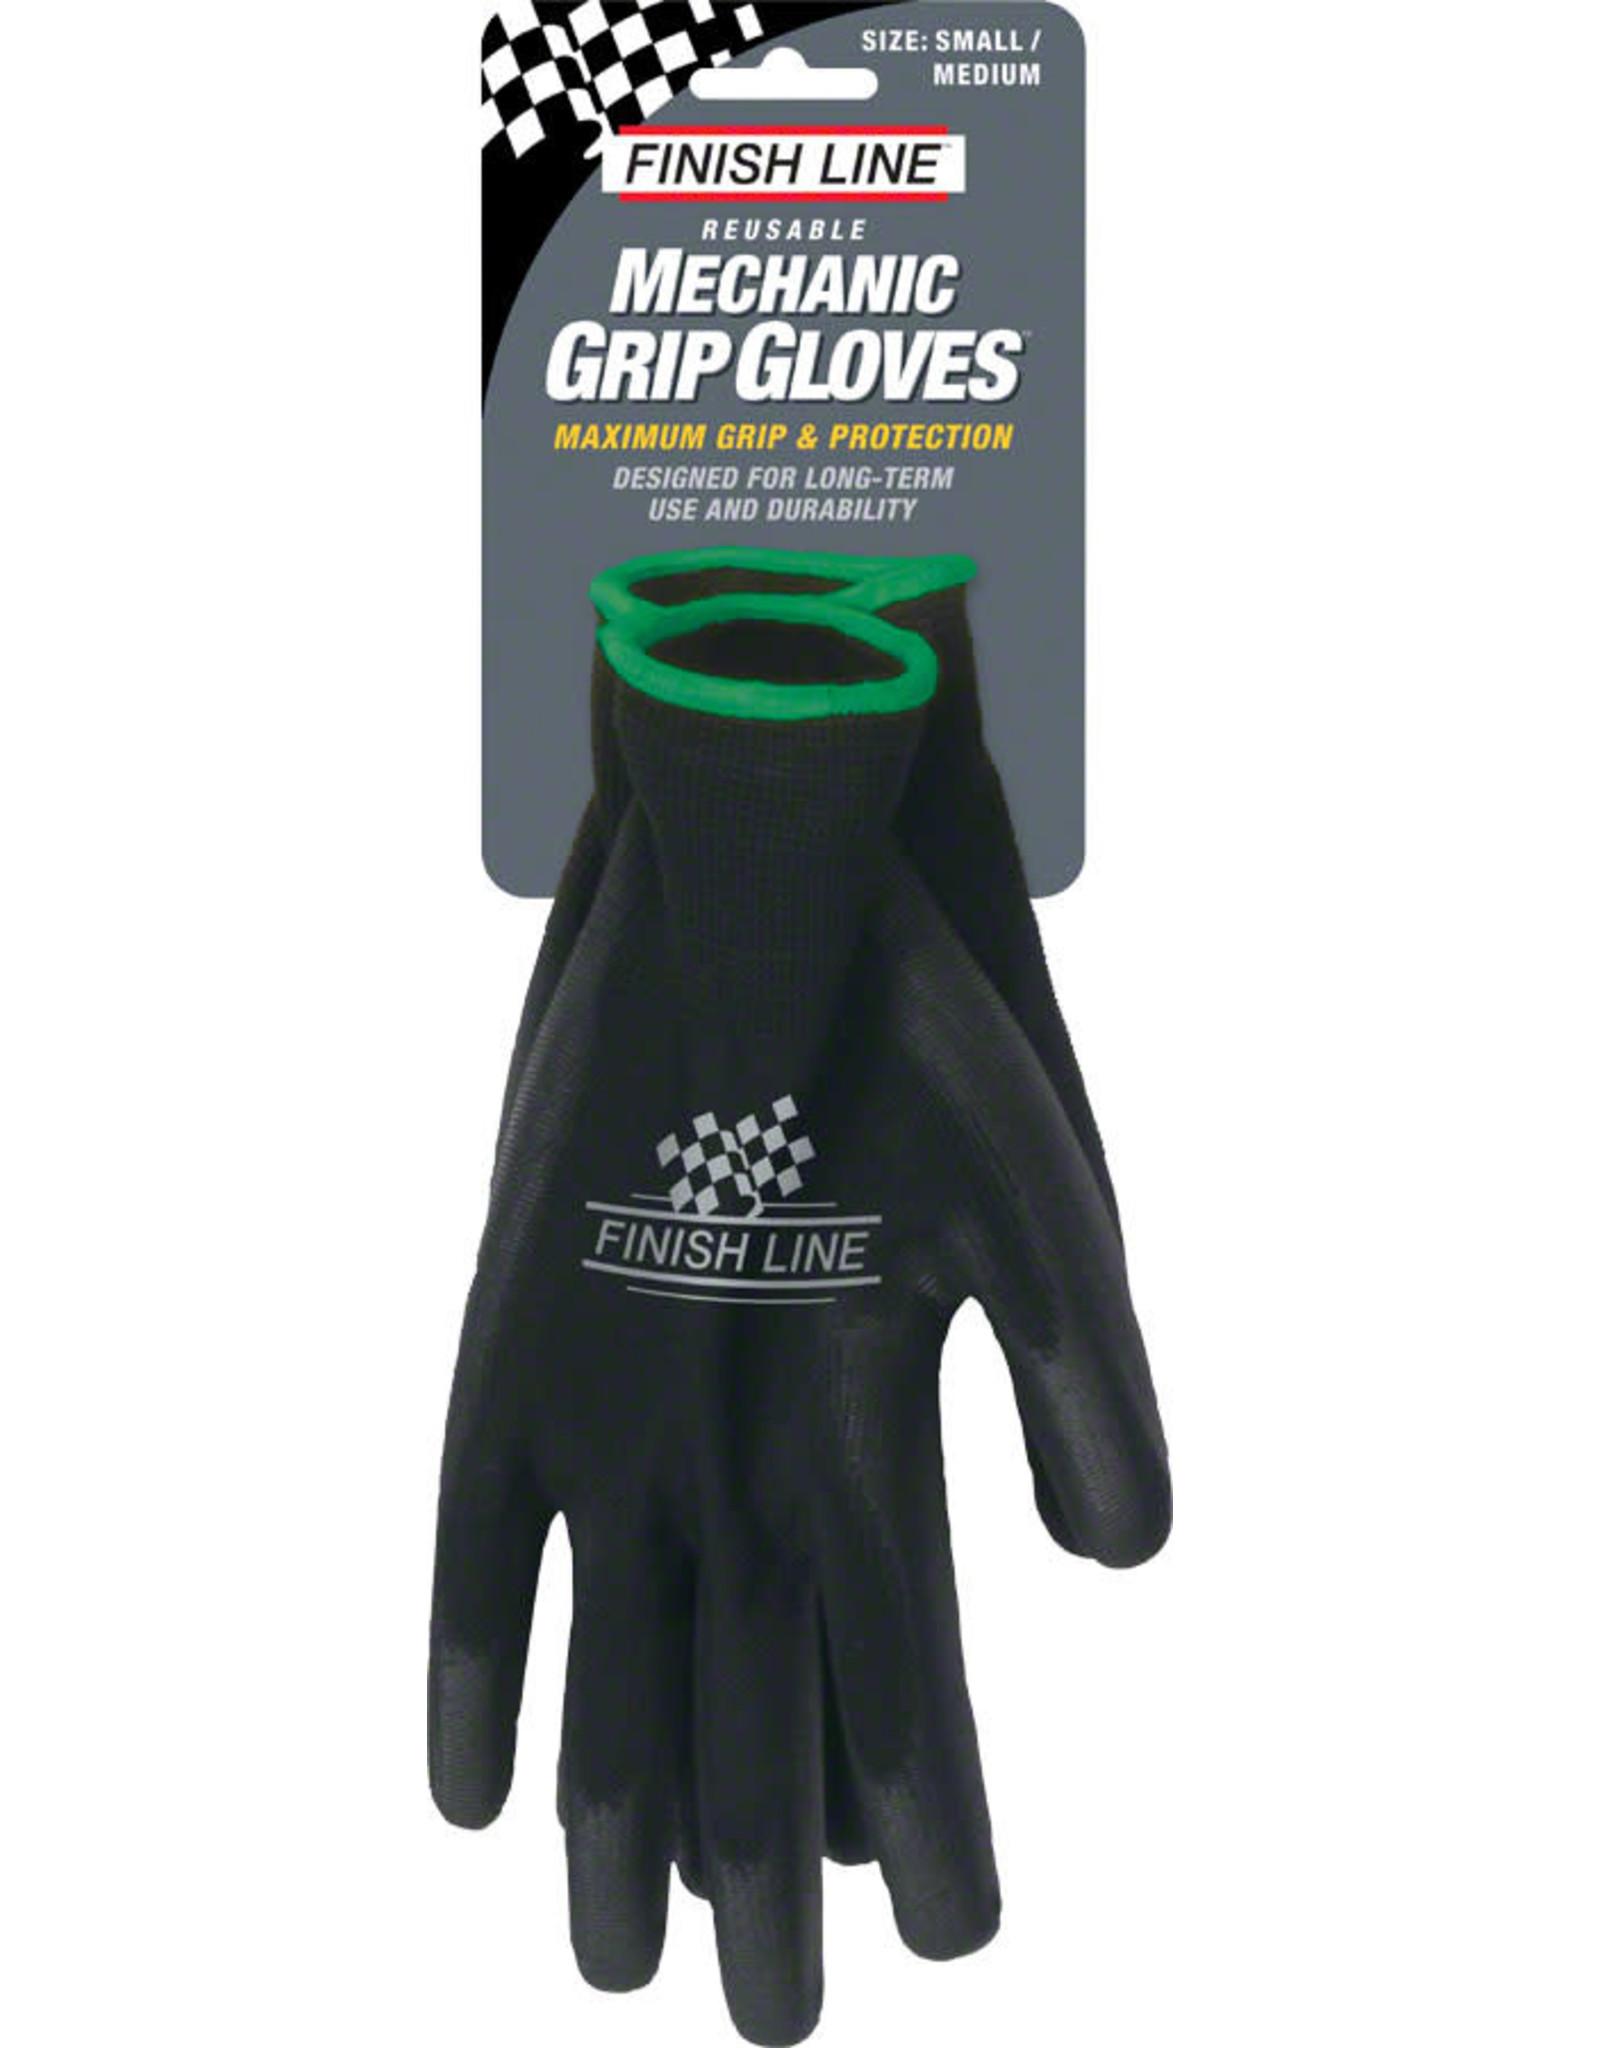 Finish Line Finish Line Mechanic's Grip Gloves, SM/MD